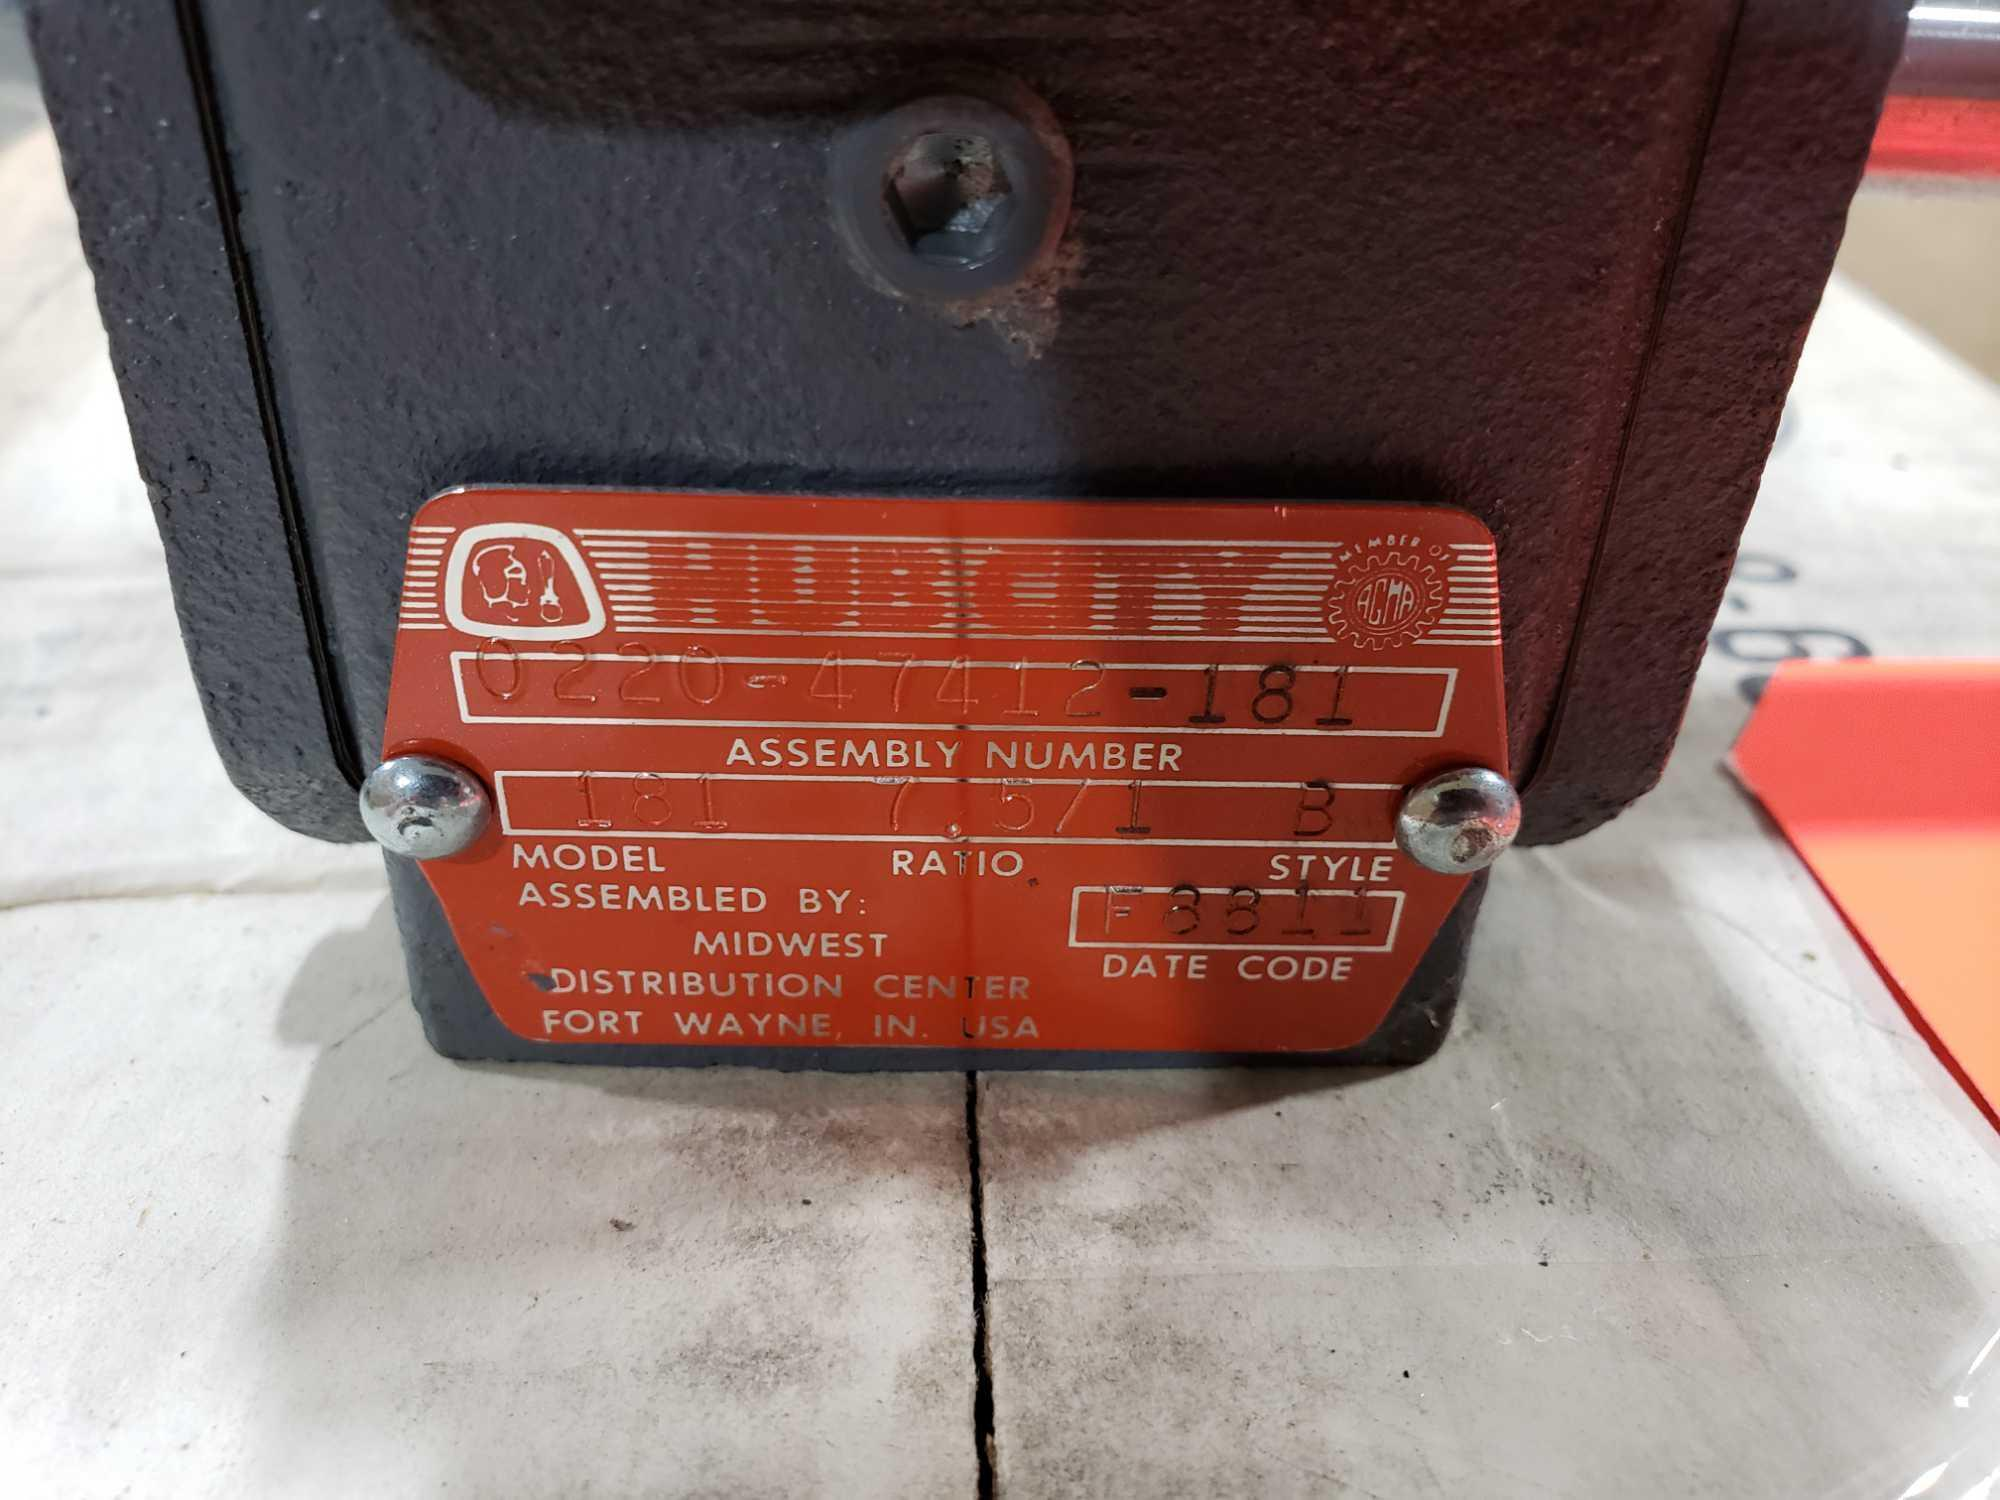 Lot 36 - Hub City model 181 gear box. Ratio 7.5/1. Style B. New in box.